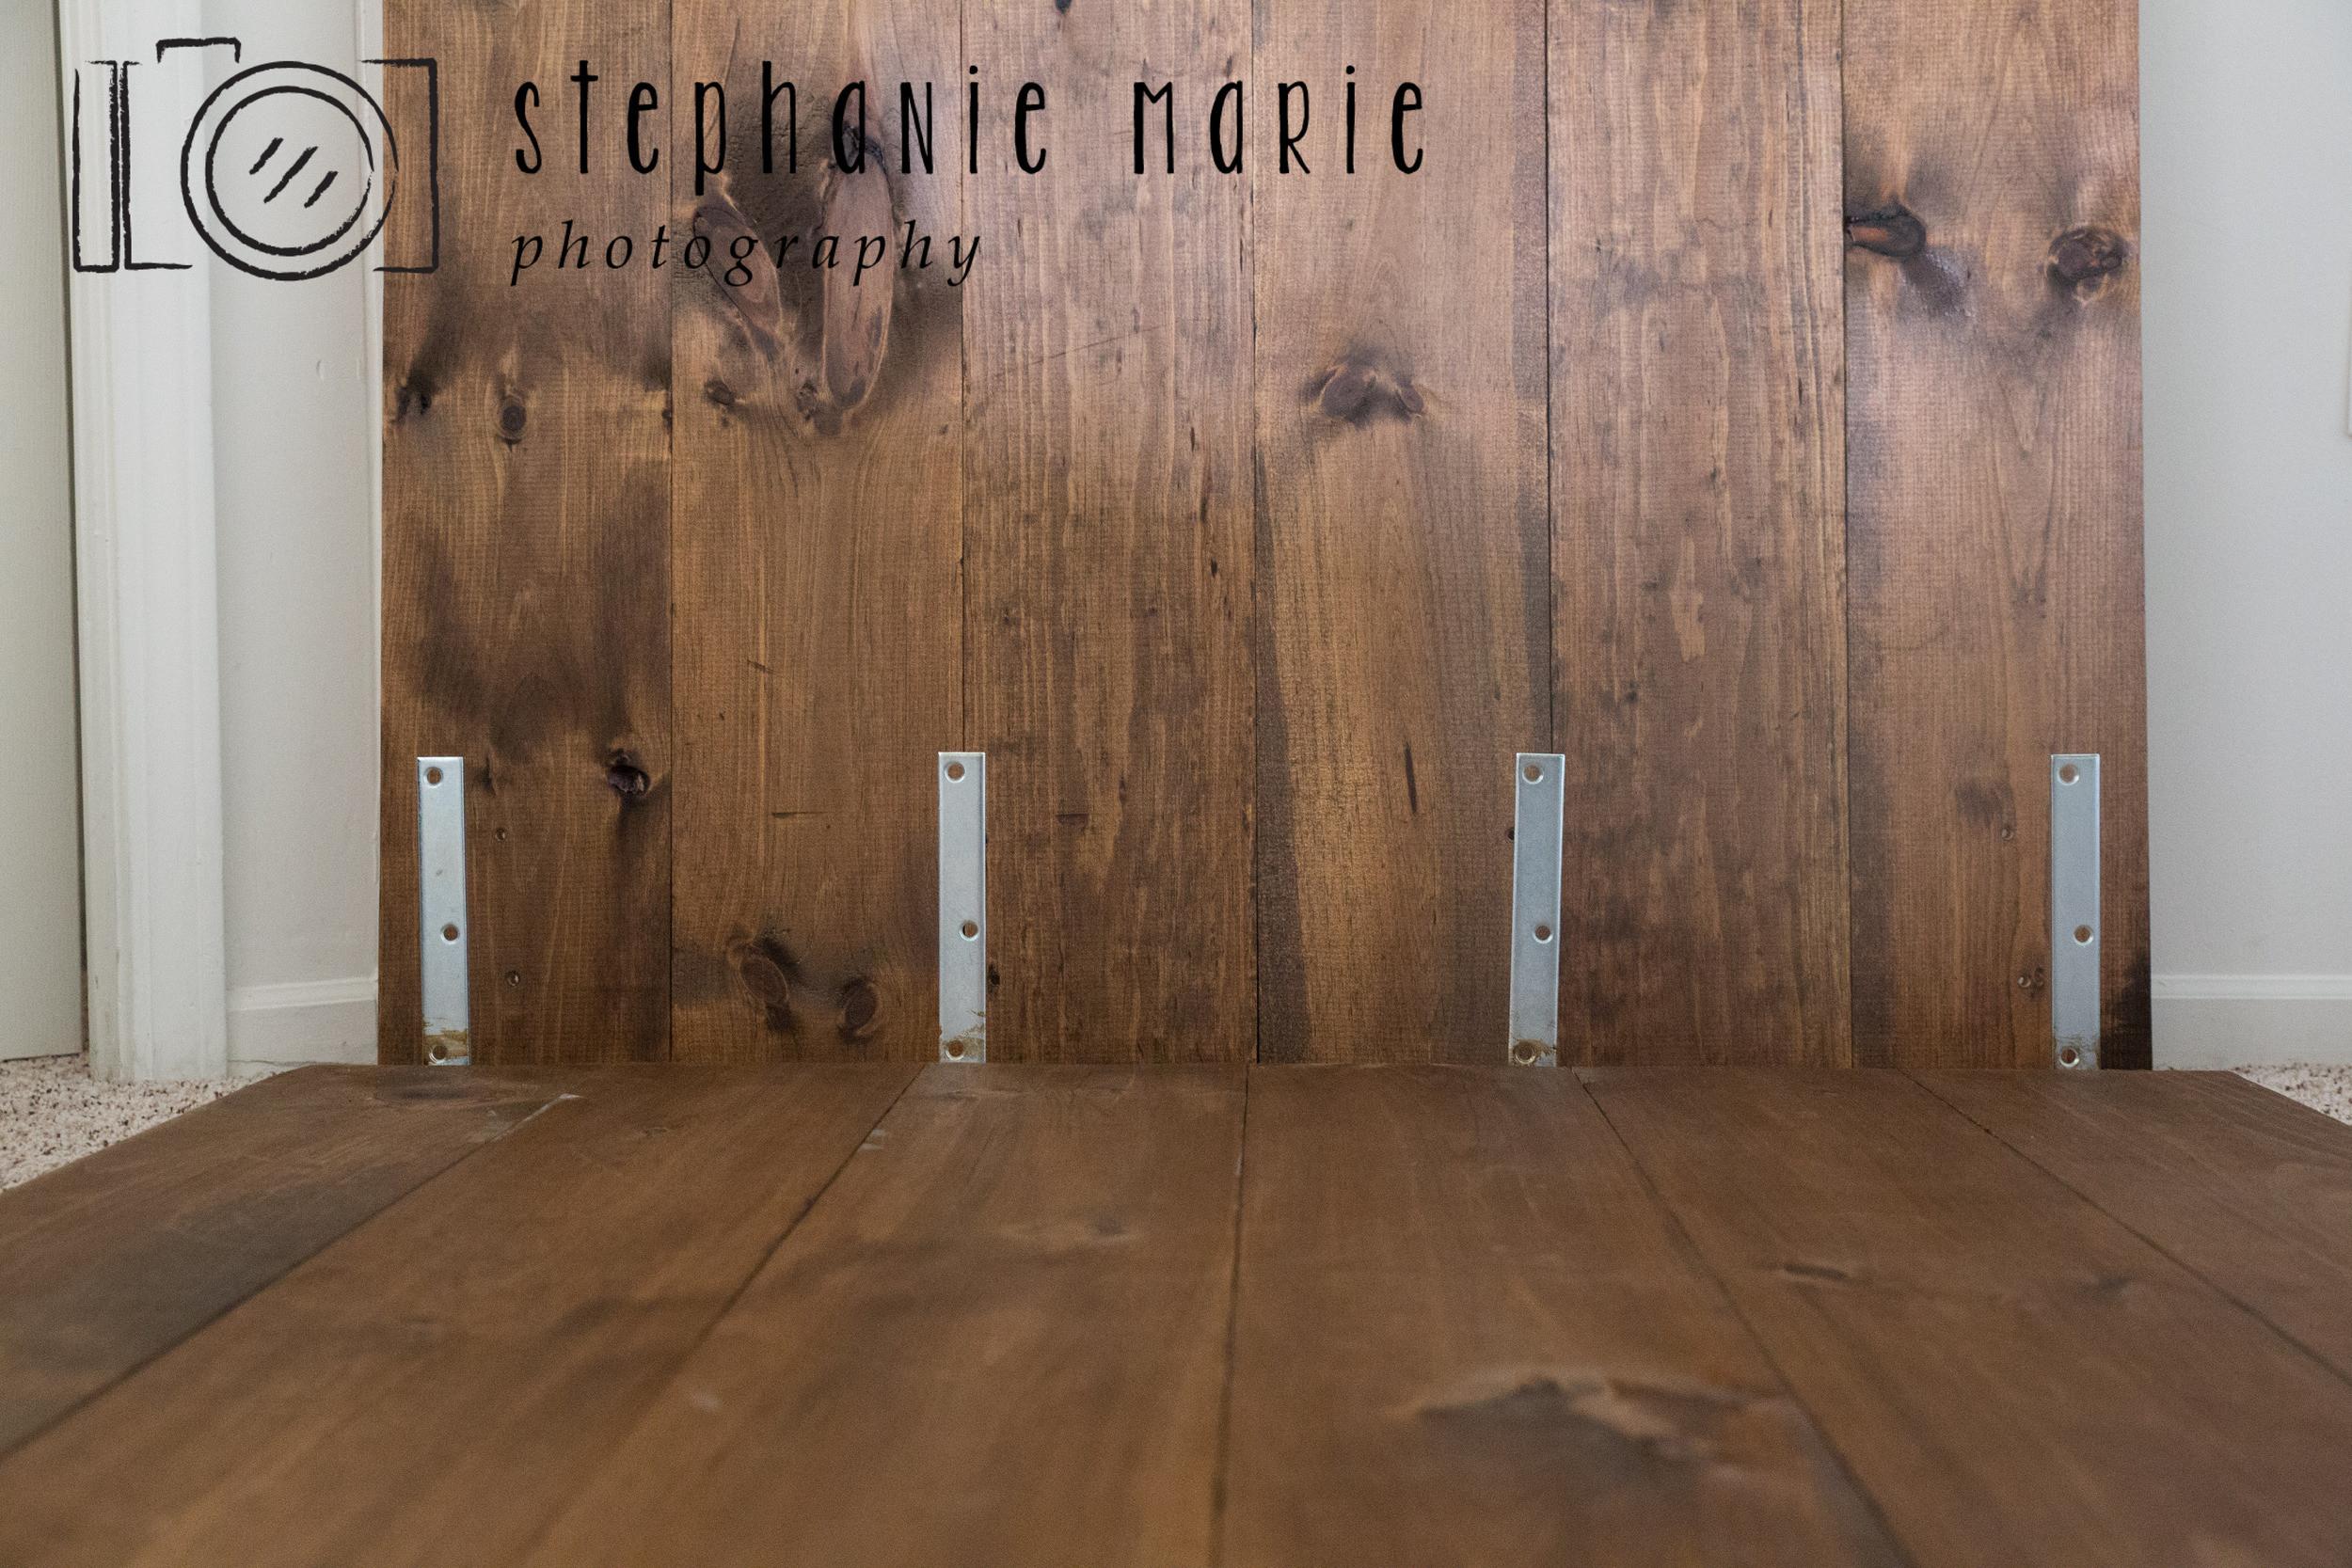 wax pencil for hardwood floor of diy faux hardwood wall floor stephanie marie photography within how to diy photography faux wood floor wall backdrop prop for photographers